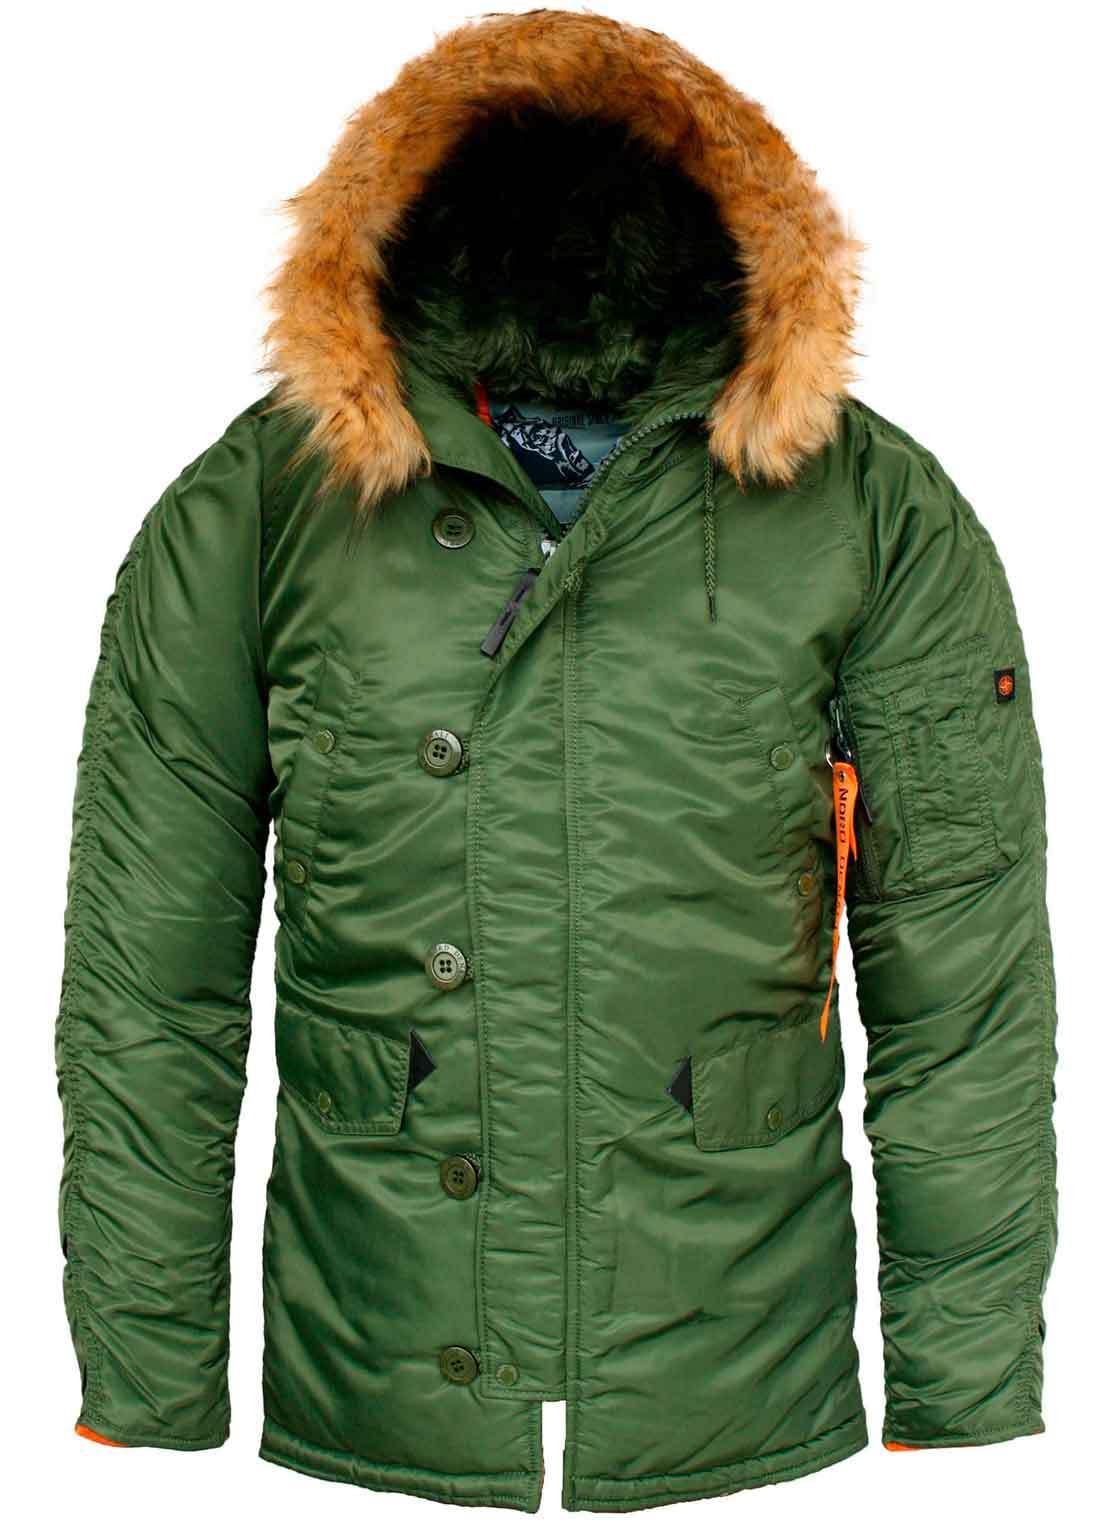 Куртка Аляска  N-3B  Husky Denali  (зеленая - r.green/orange)